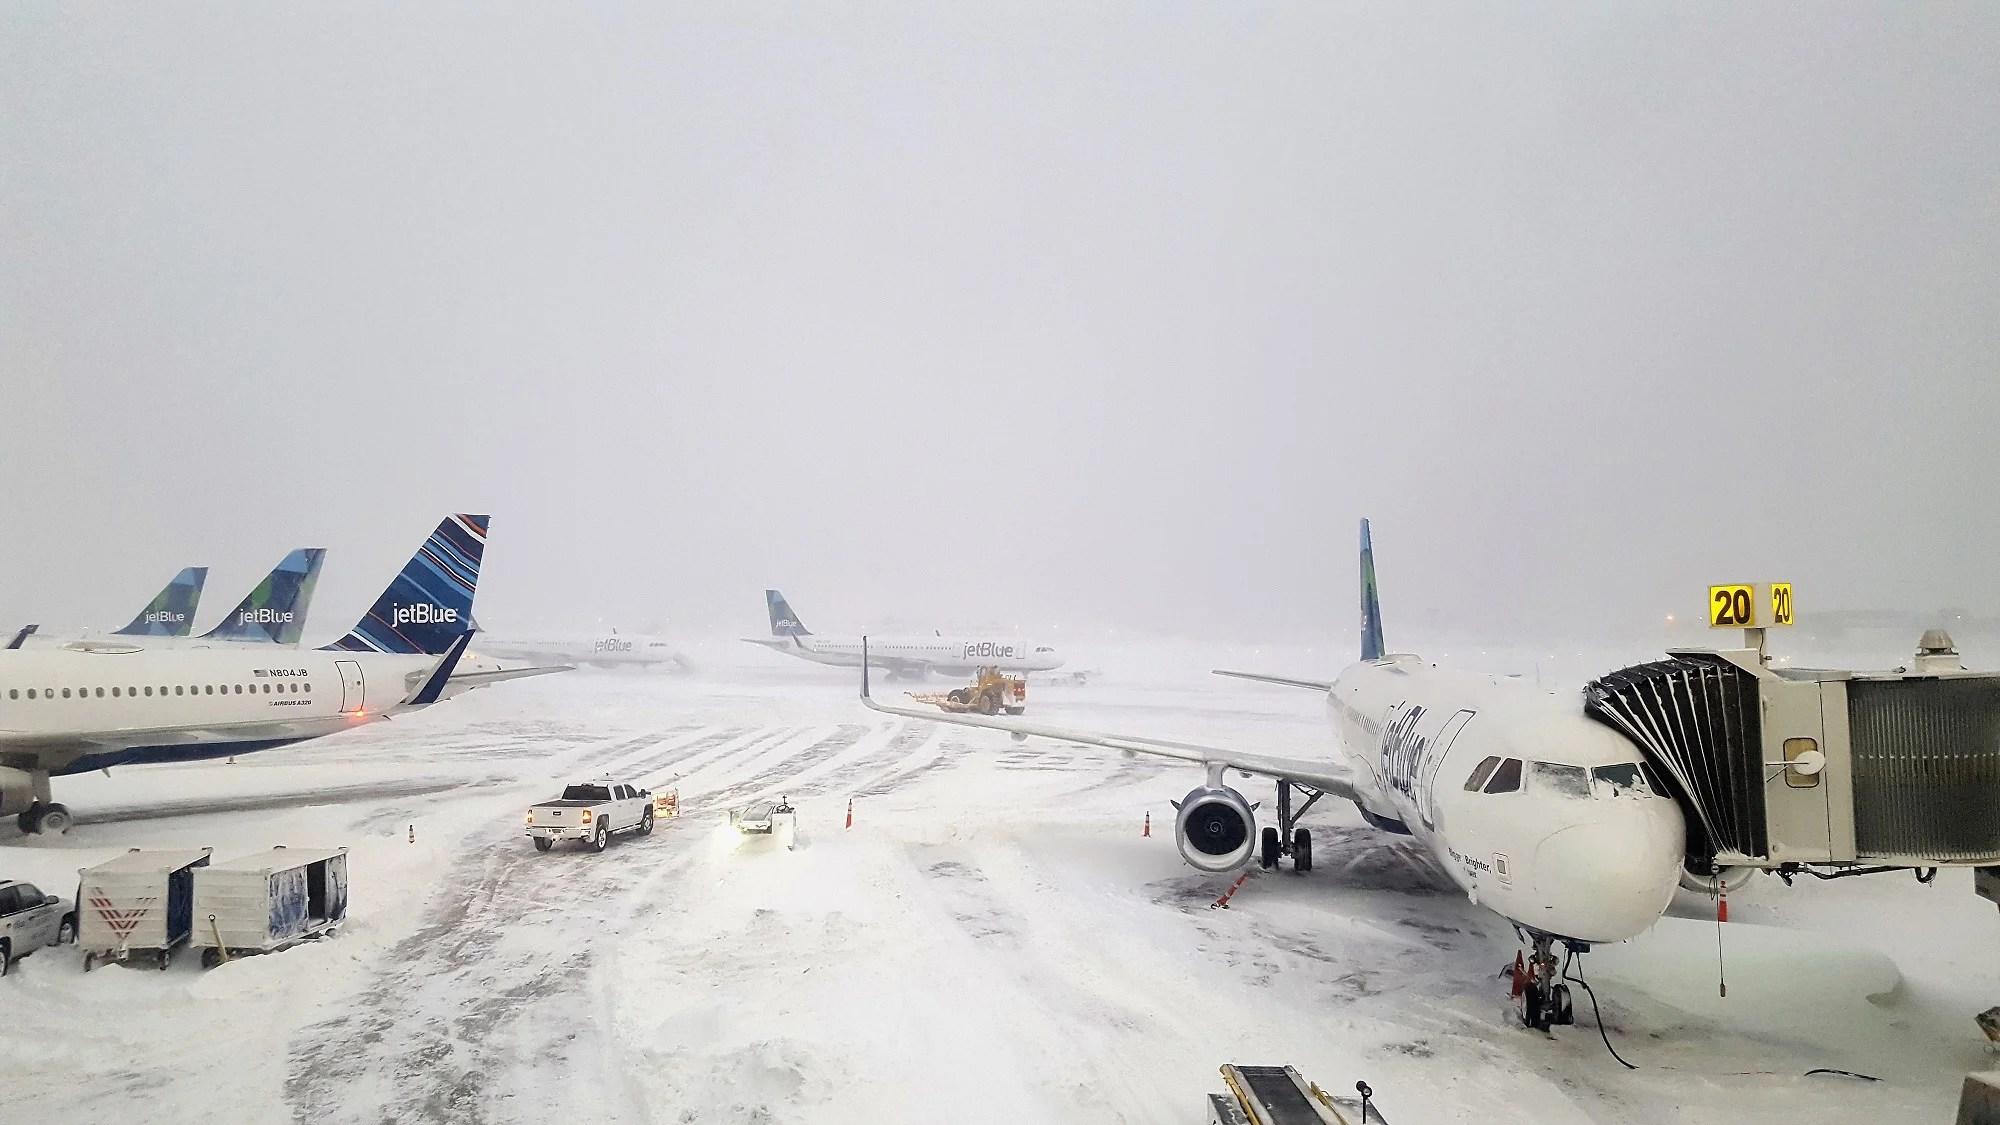 Resultado de imagen para winter storm avery airports